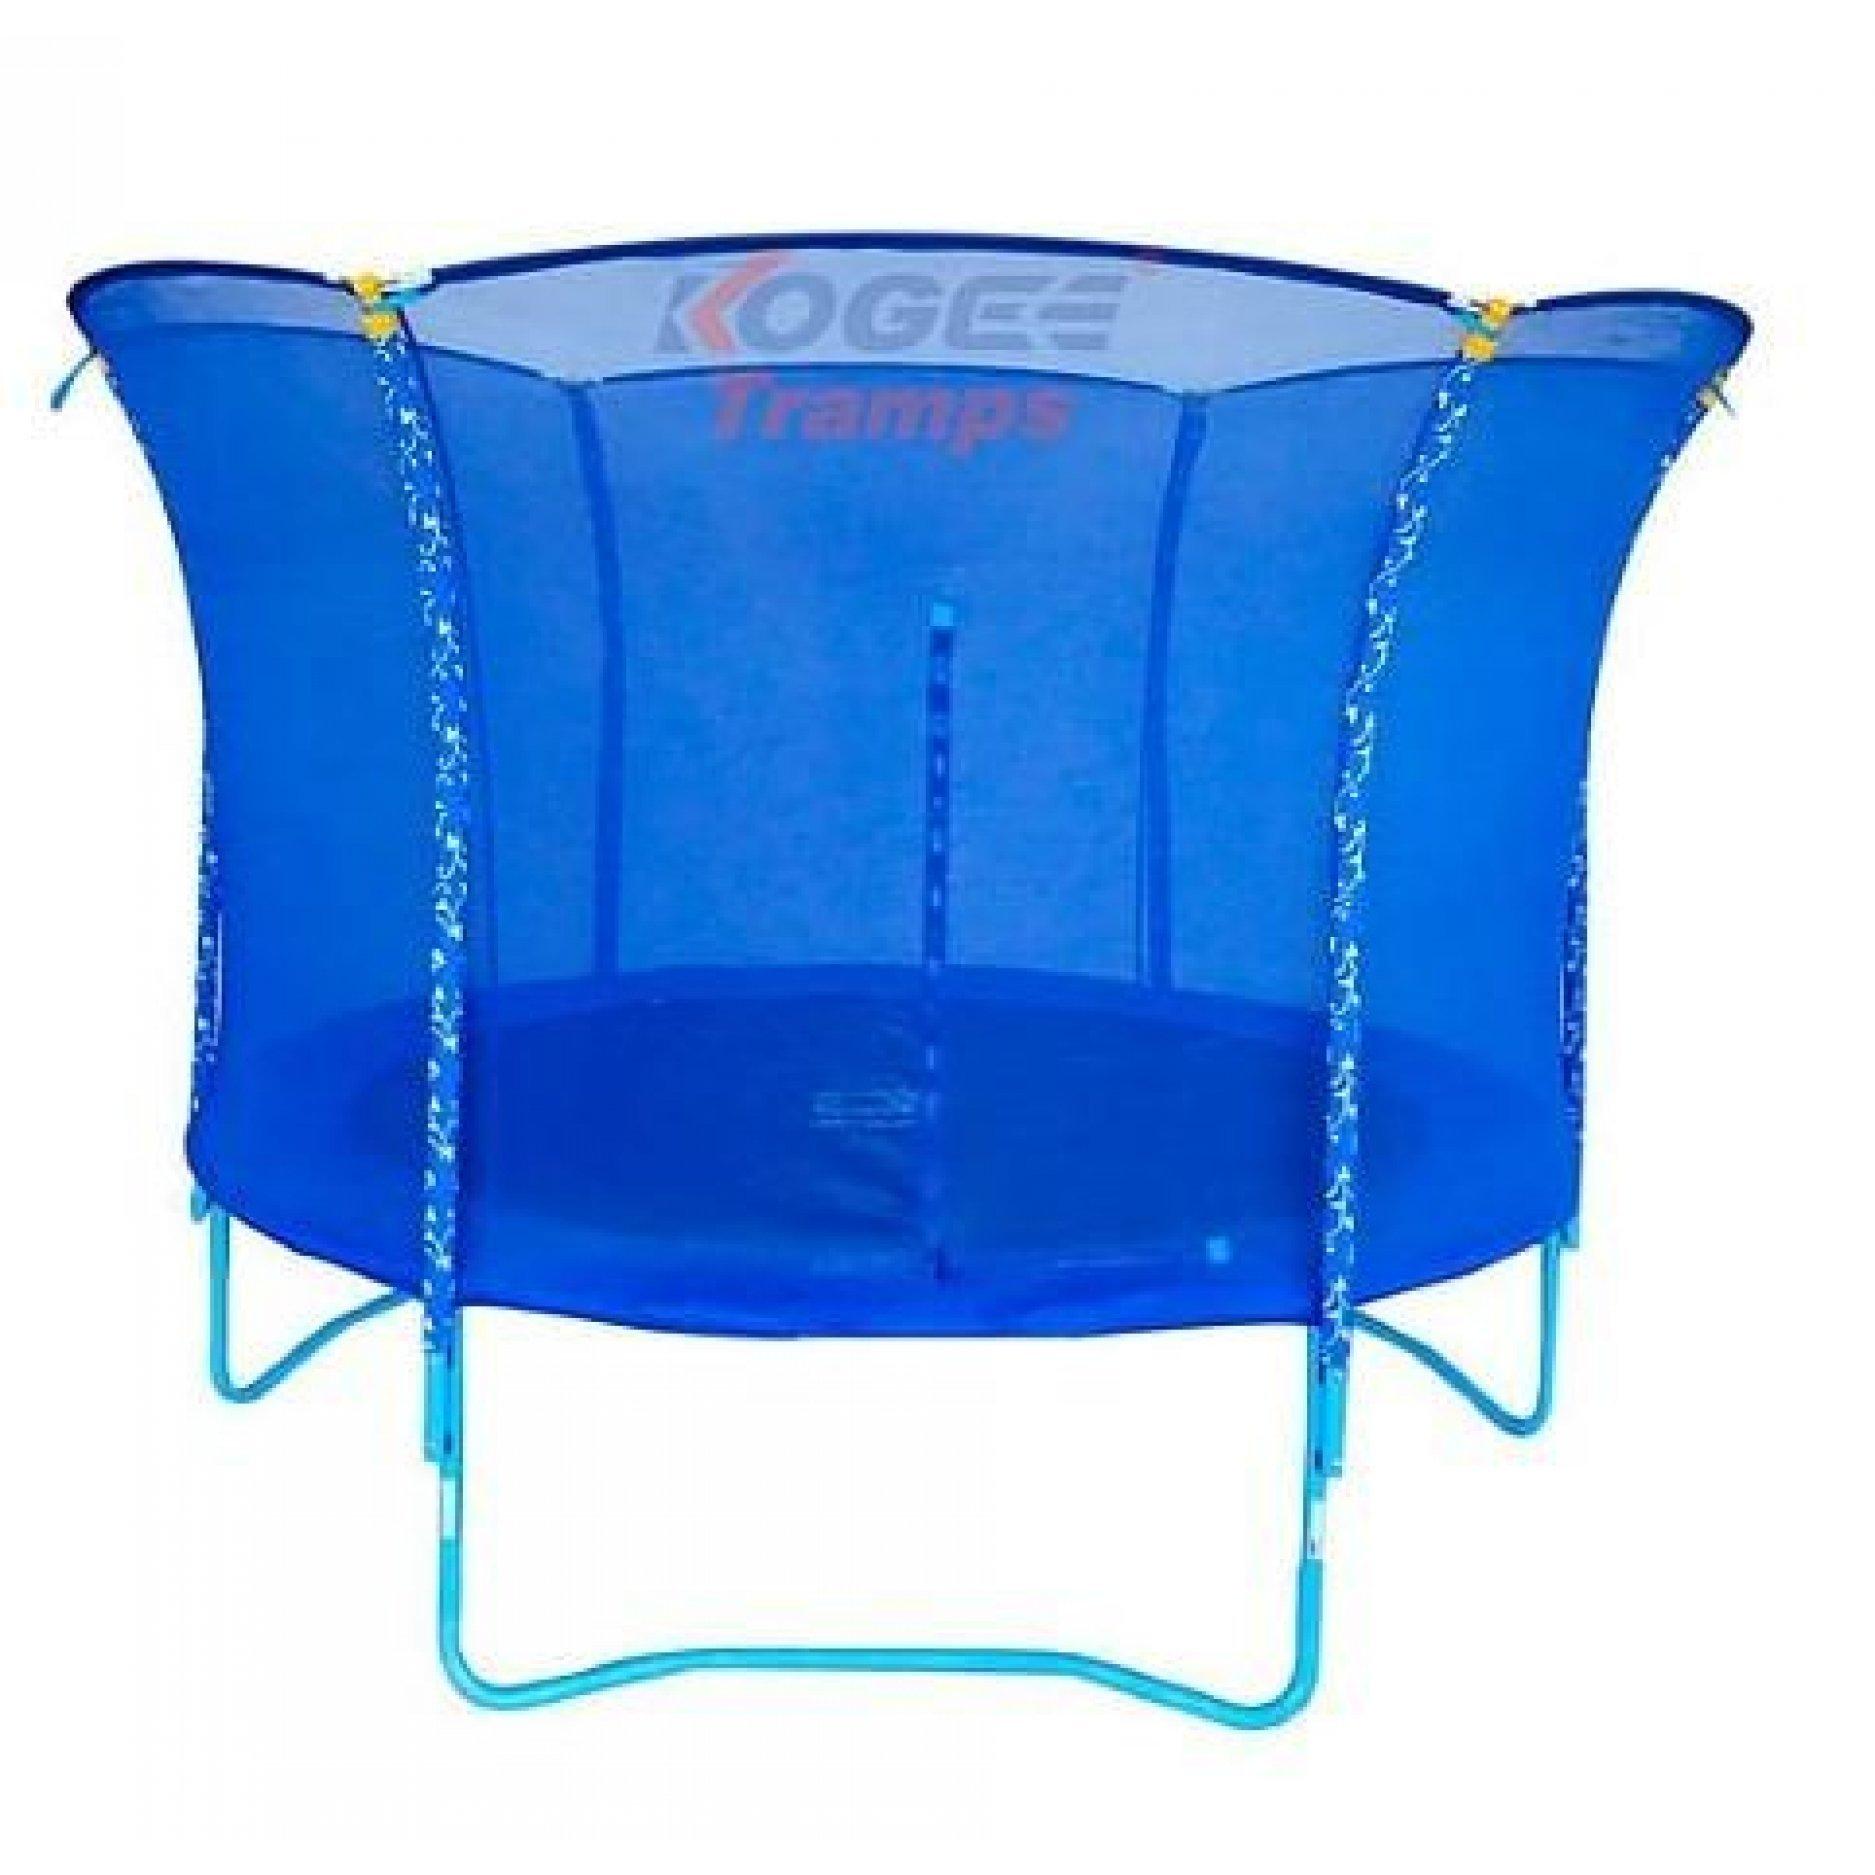 Батут Kogee-Tramps Lily синий – 3,0 м